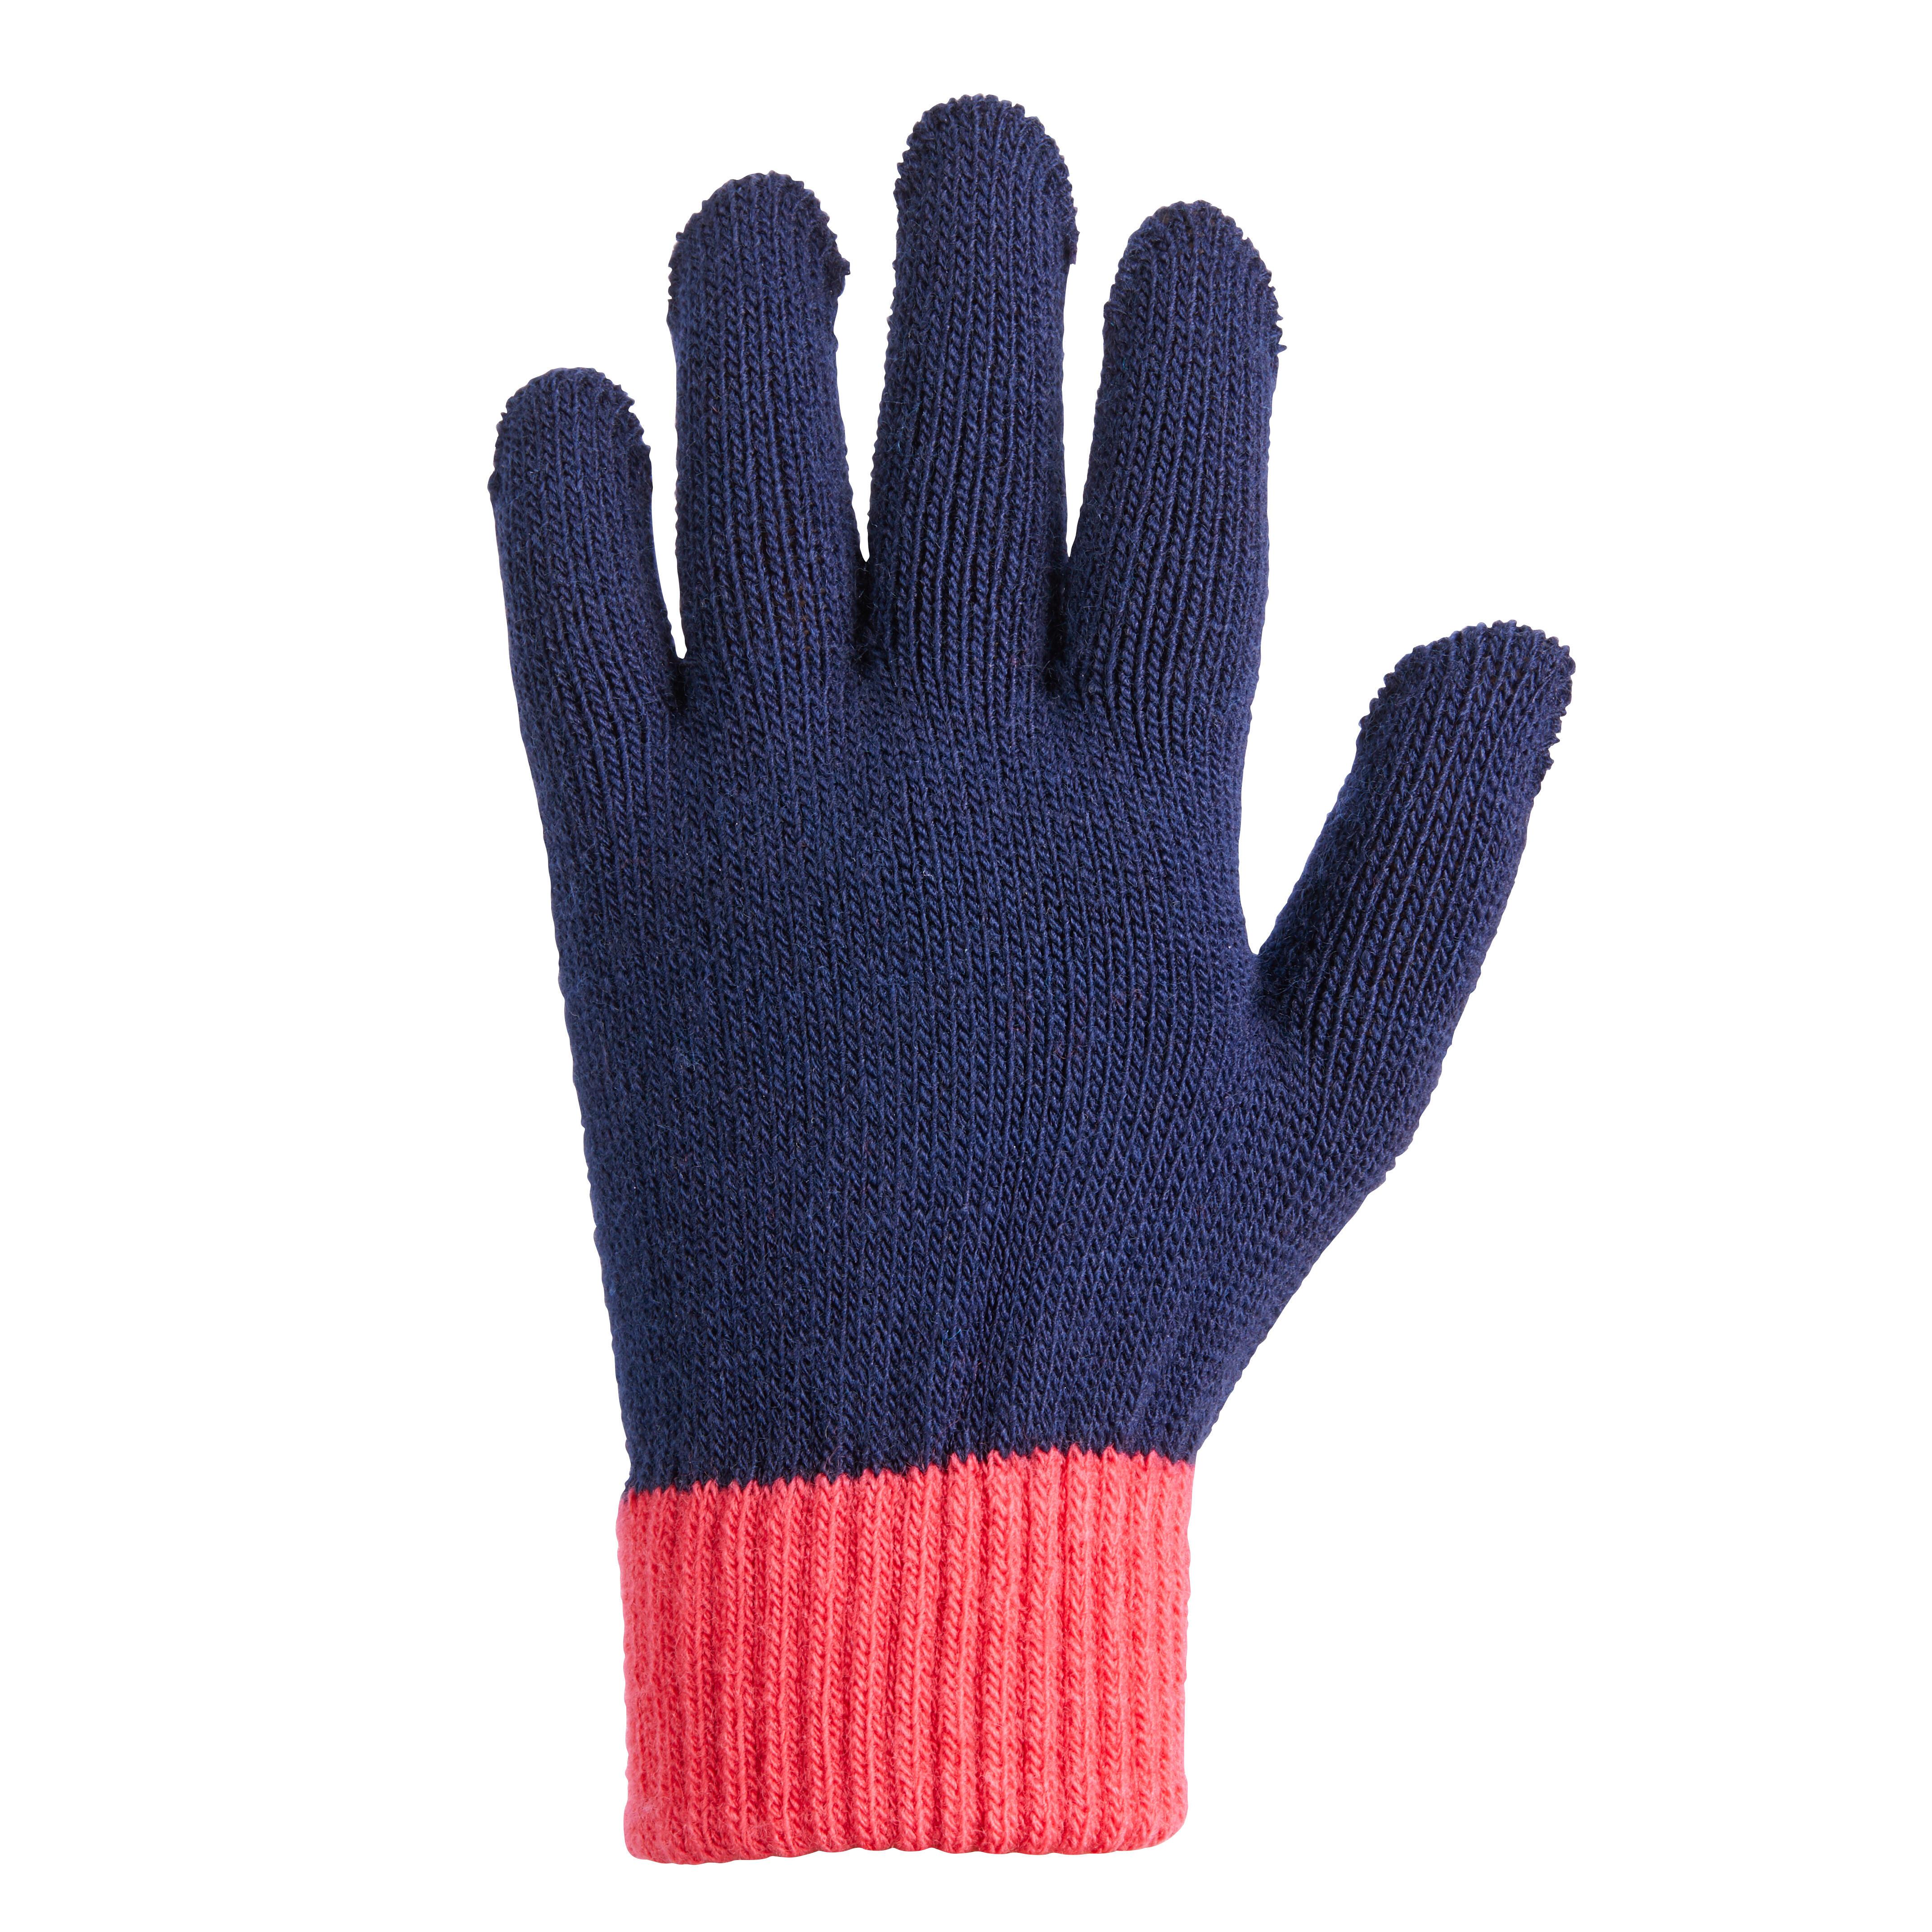 Handschoenen Kopen Decathlonnl